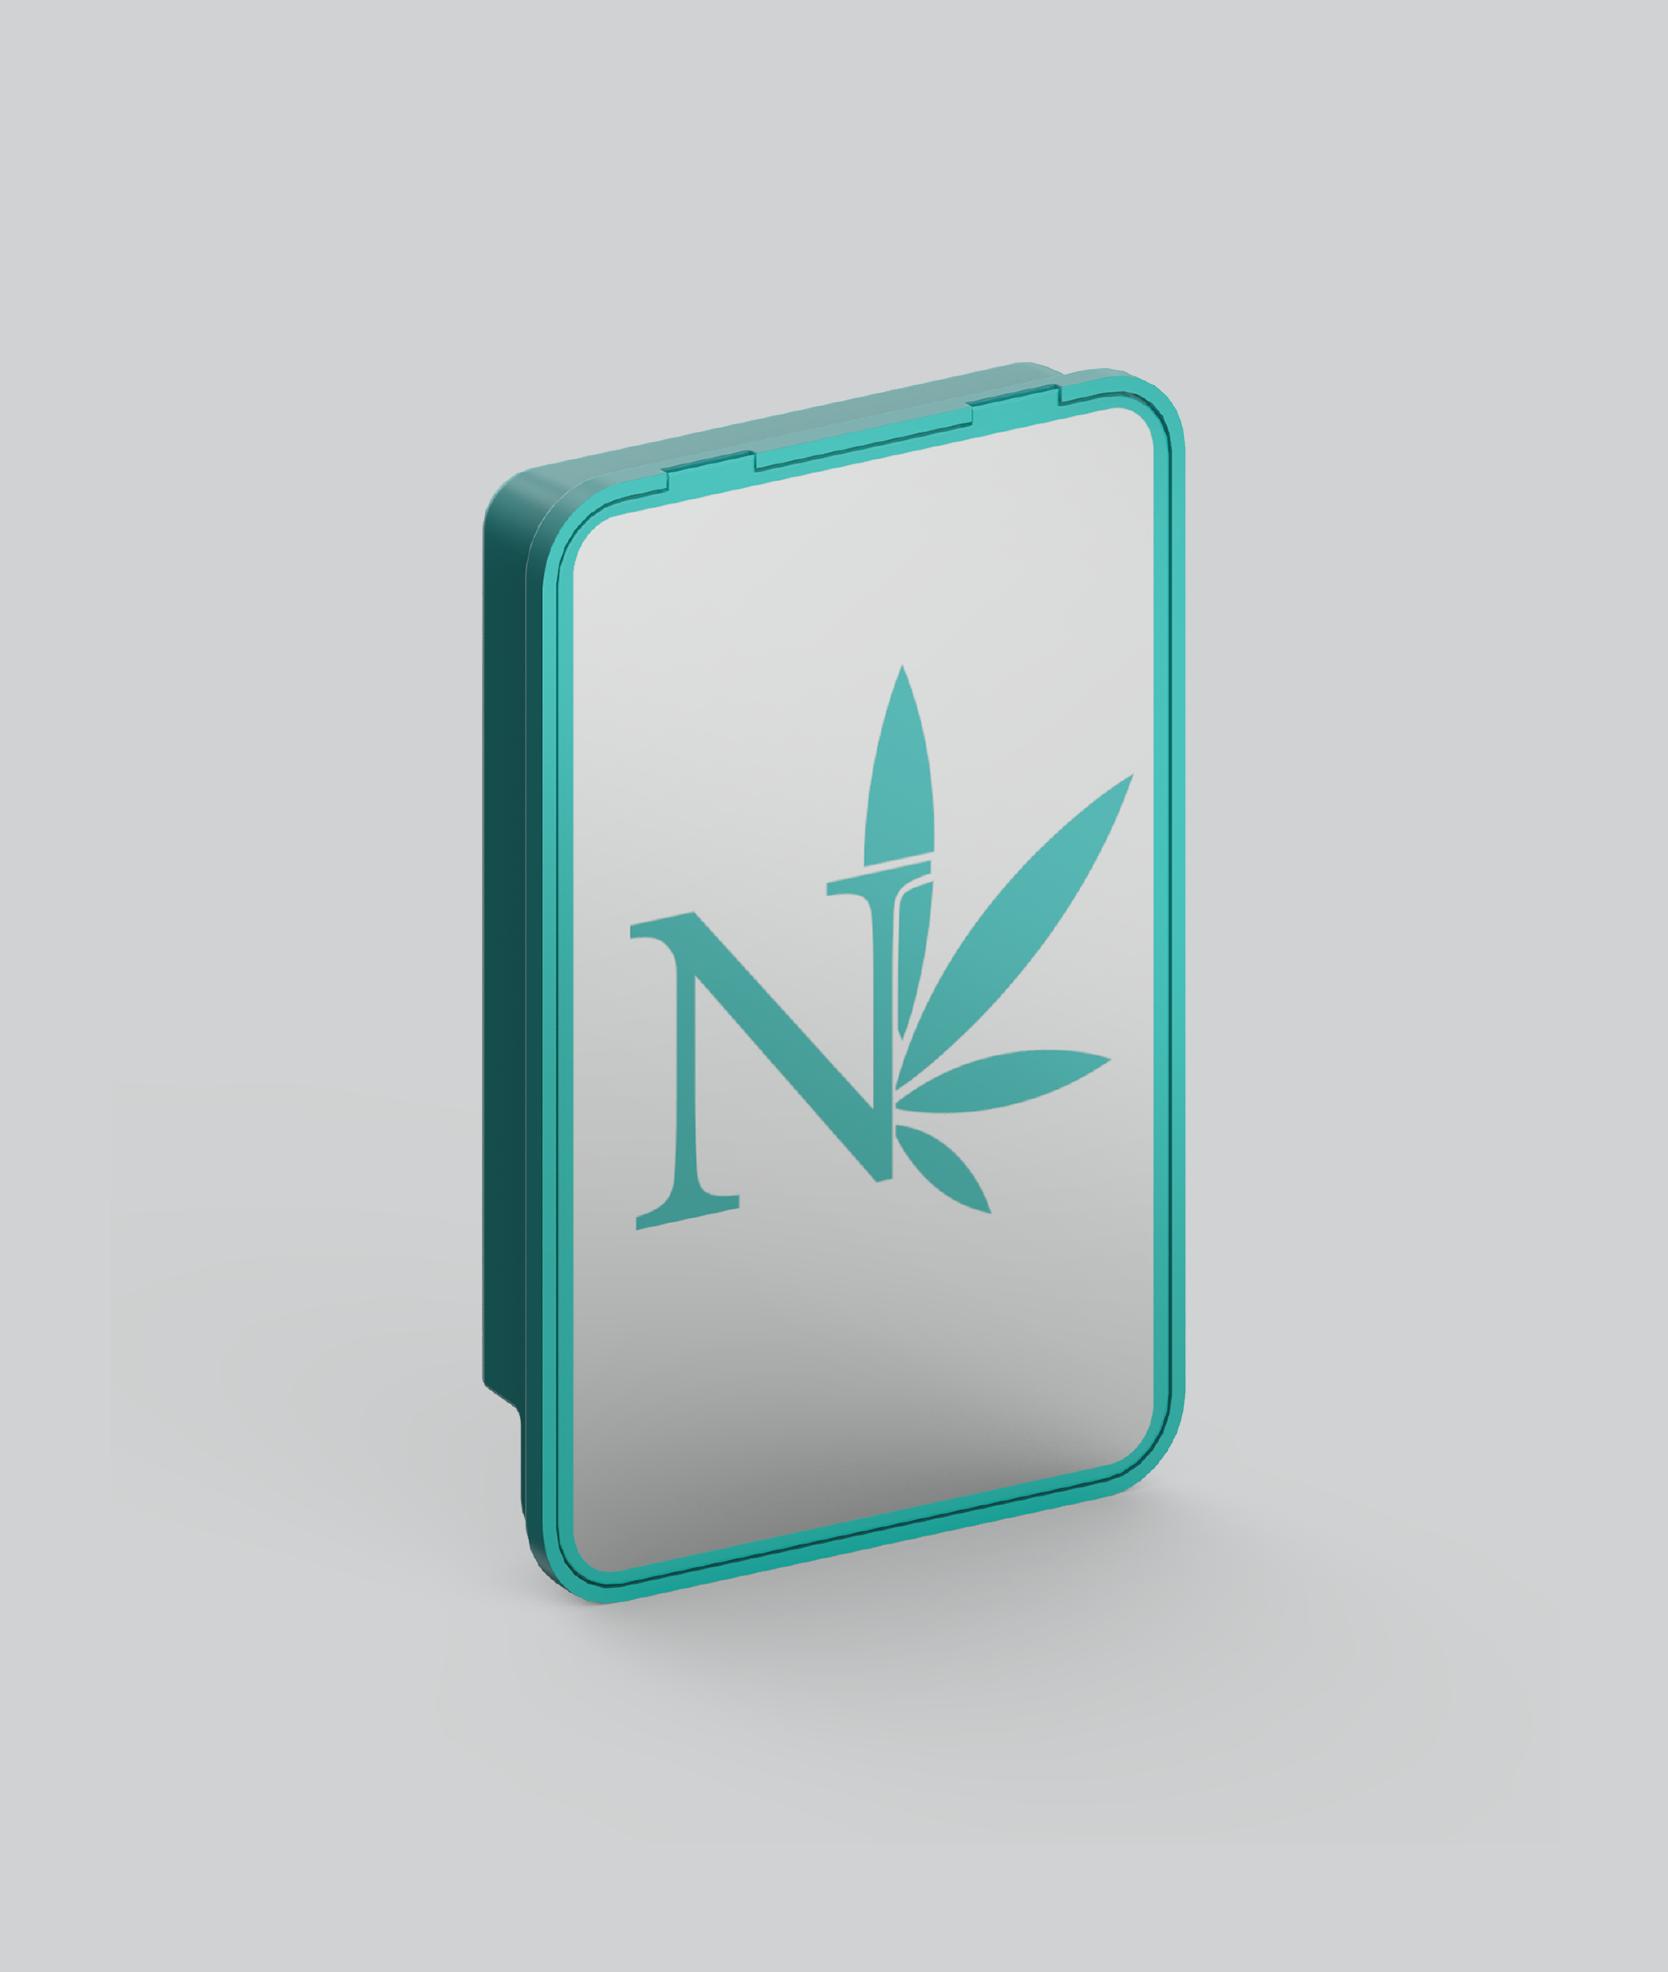 nleaf-snaptech-case-medical-cbd-pre-roll-case